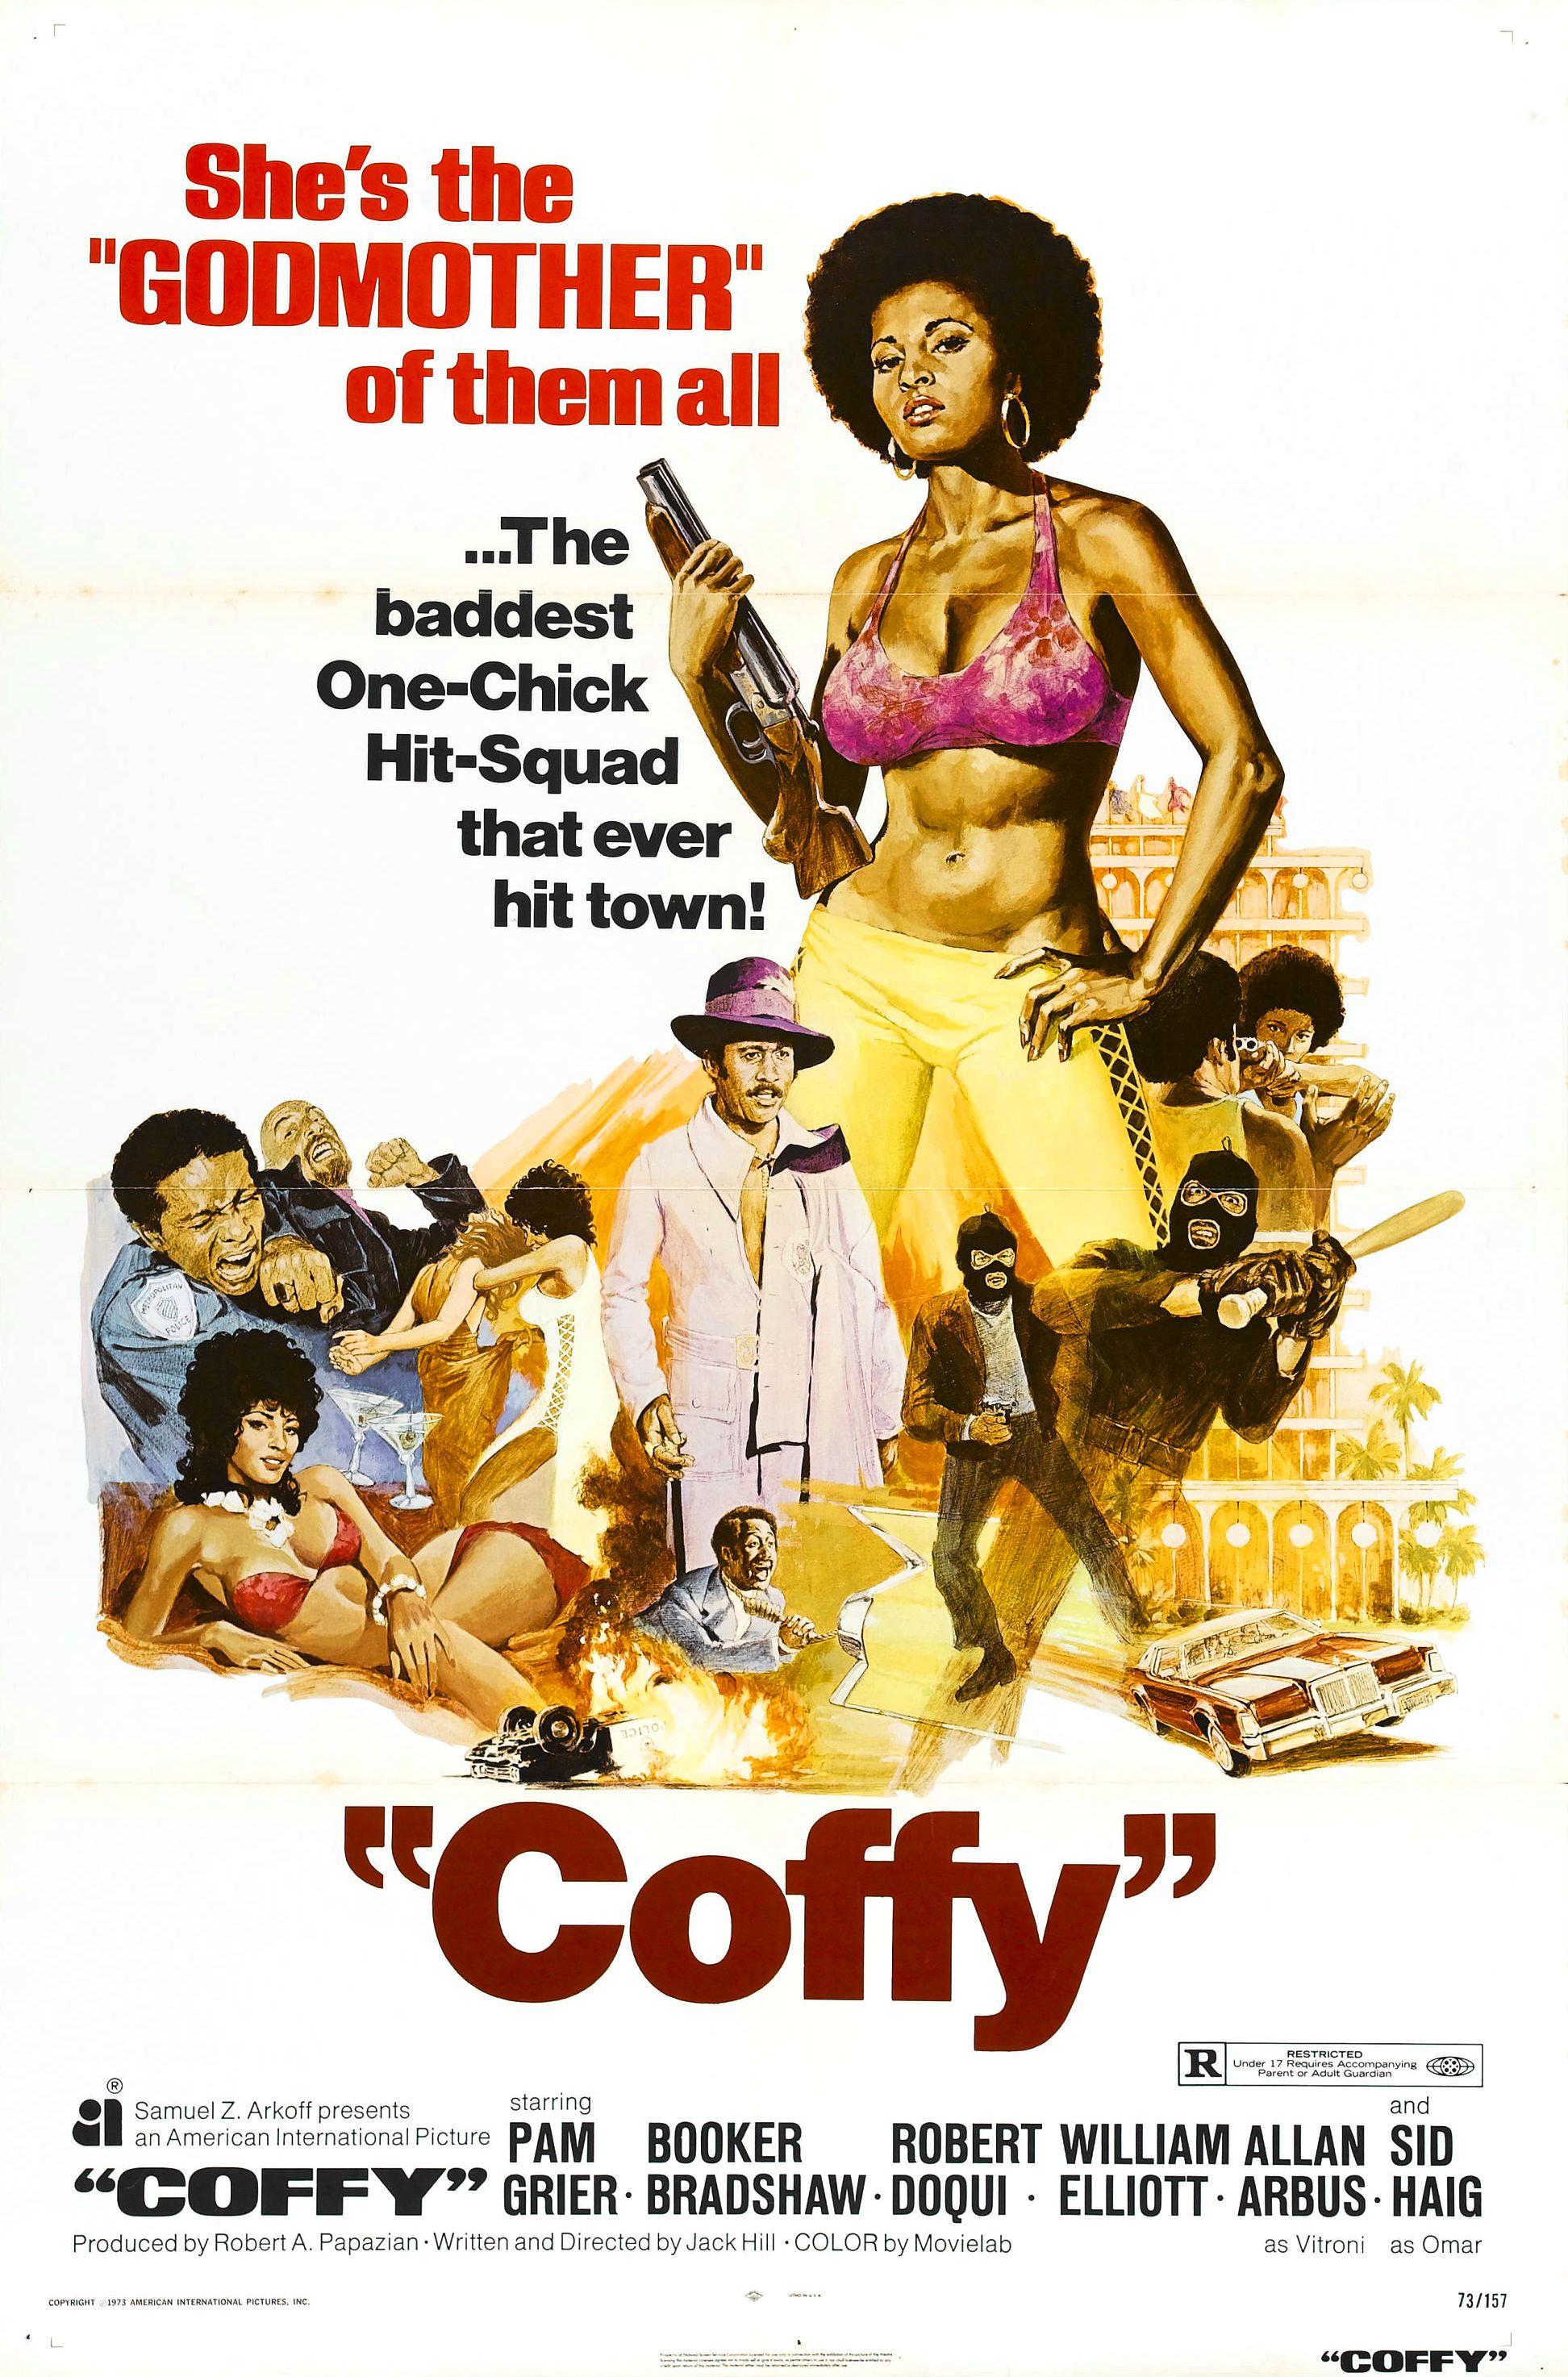 January 28th, 2011: Coffy u00ab The League of Dead Films